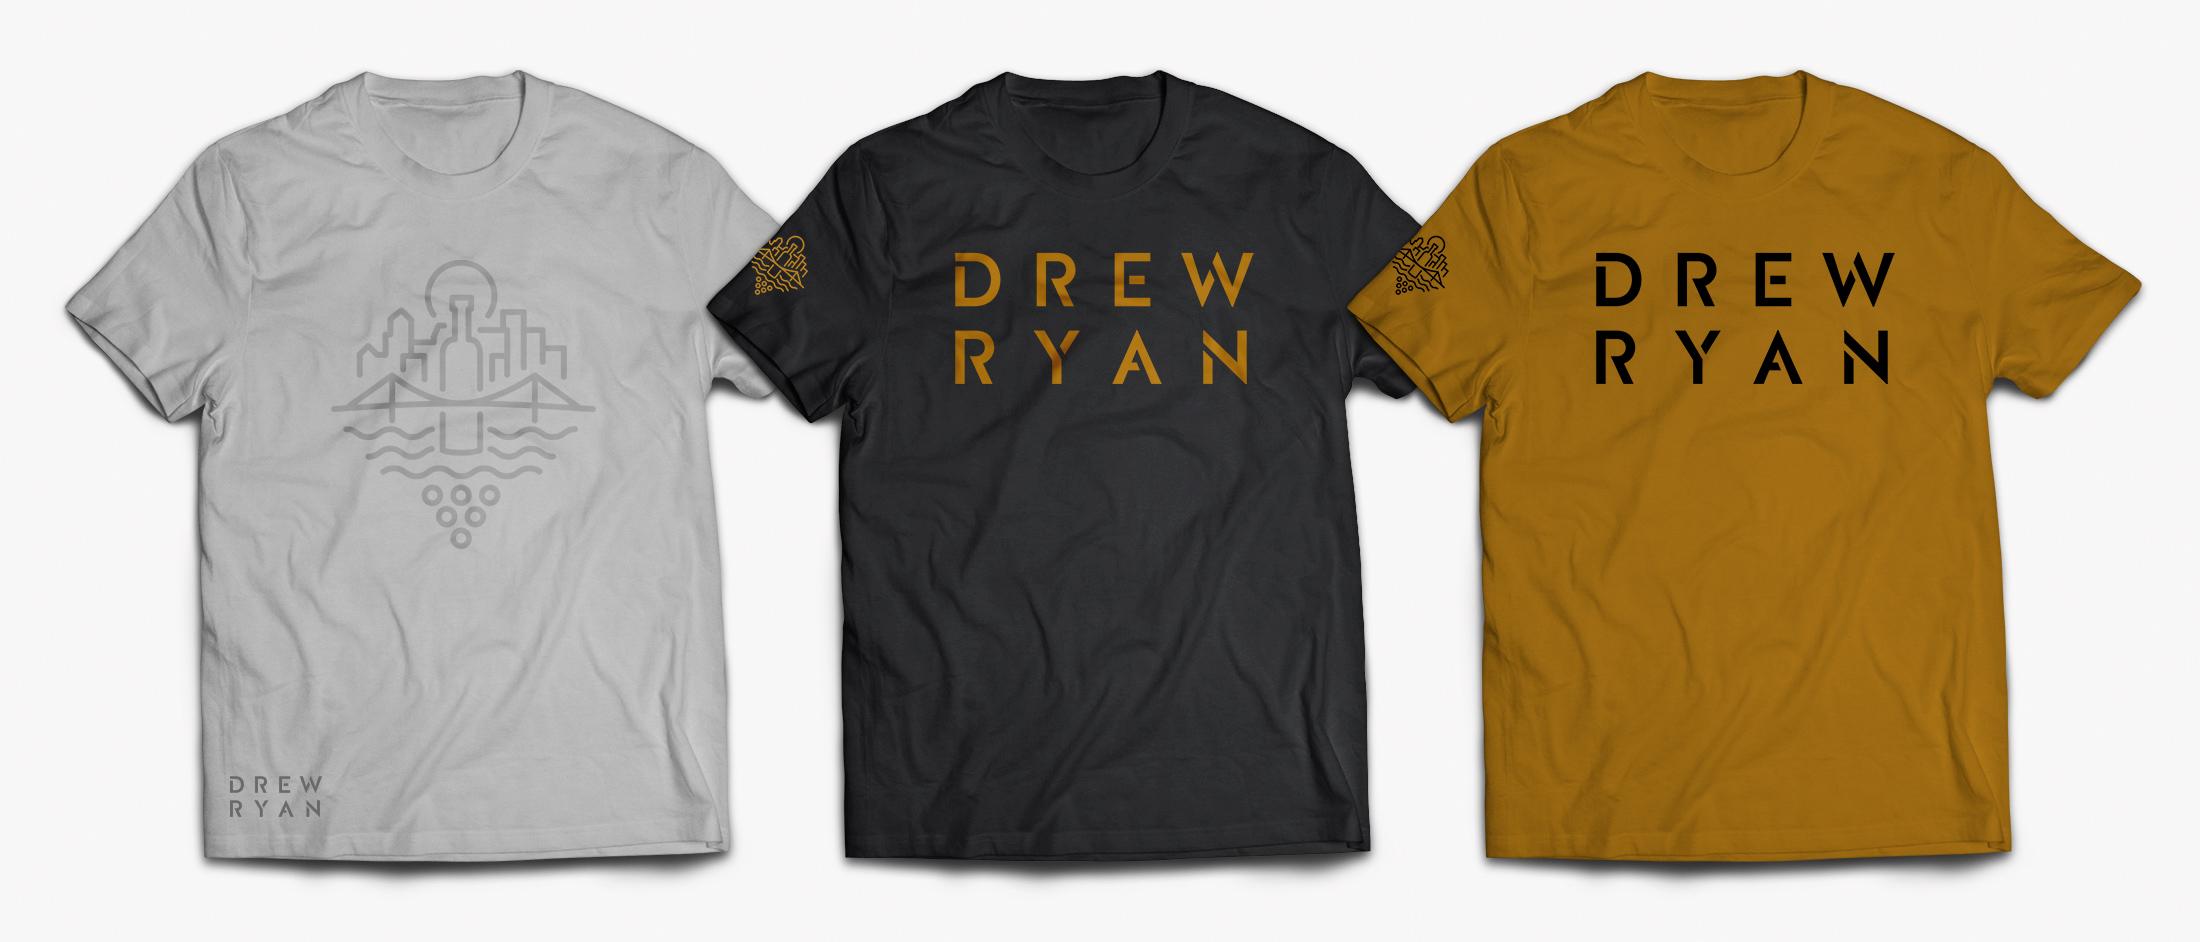 Wine-Branding_Ebbing_Drew-Ryan-Wine-Apparel-Design-Tshirt.jpg